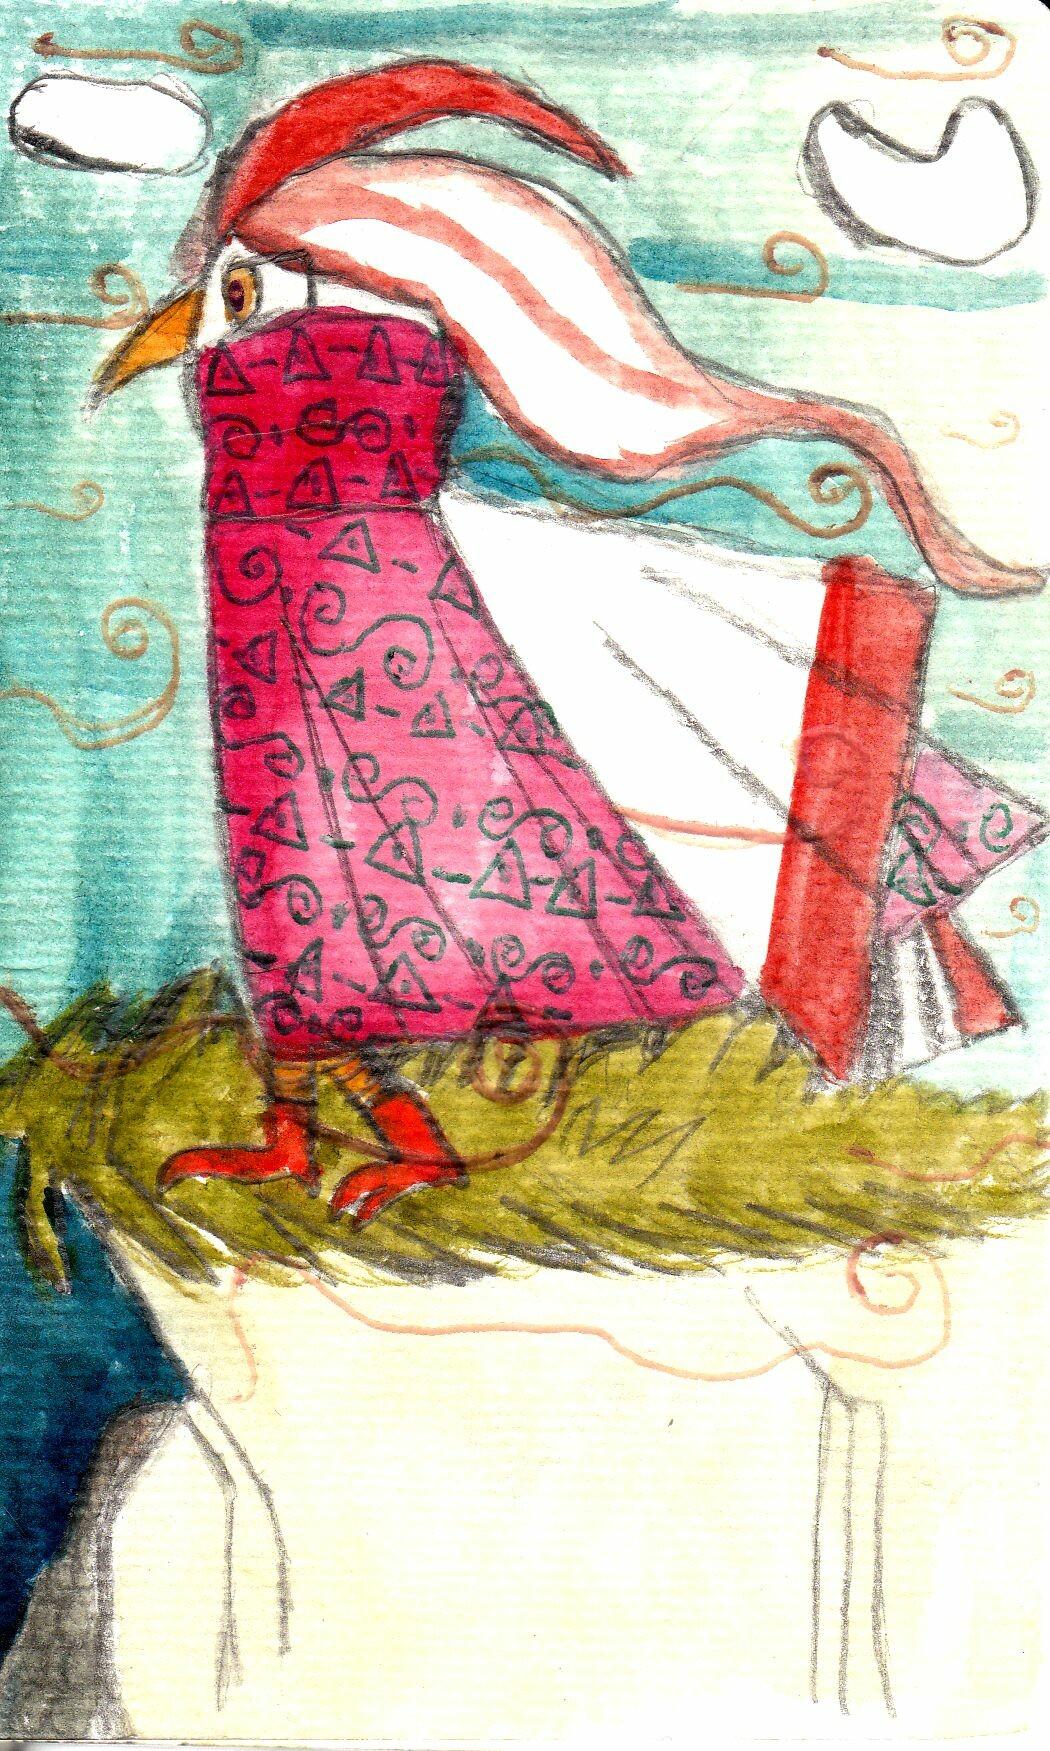 Anei ragdowl cd falaise personnage oiseau au vent